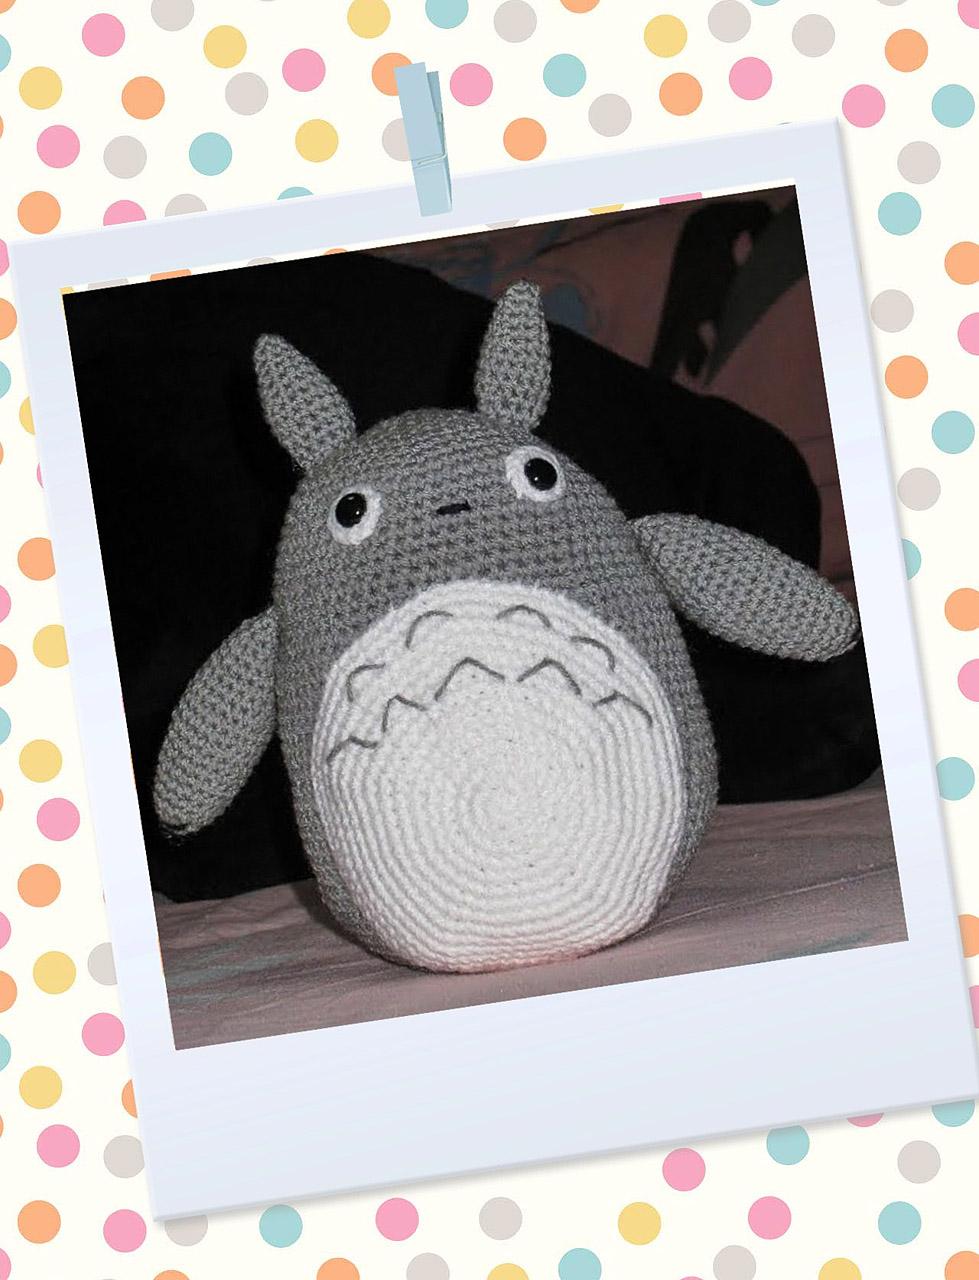 Amigurumi Ninja Turtles Pattern : Totoro Amigurumi ~ Snacksies Handicraft Corner